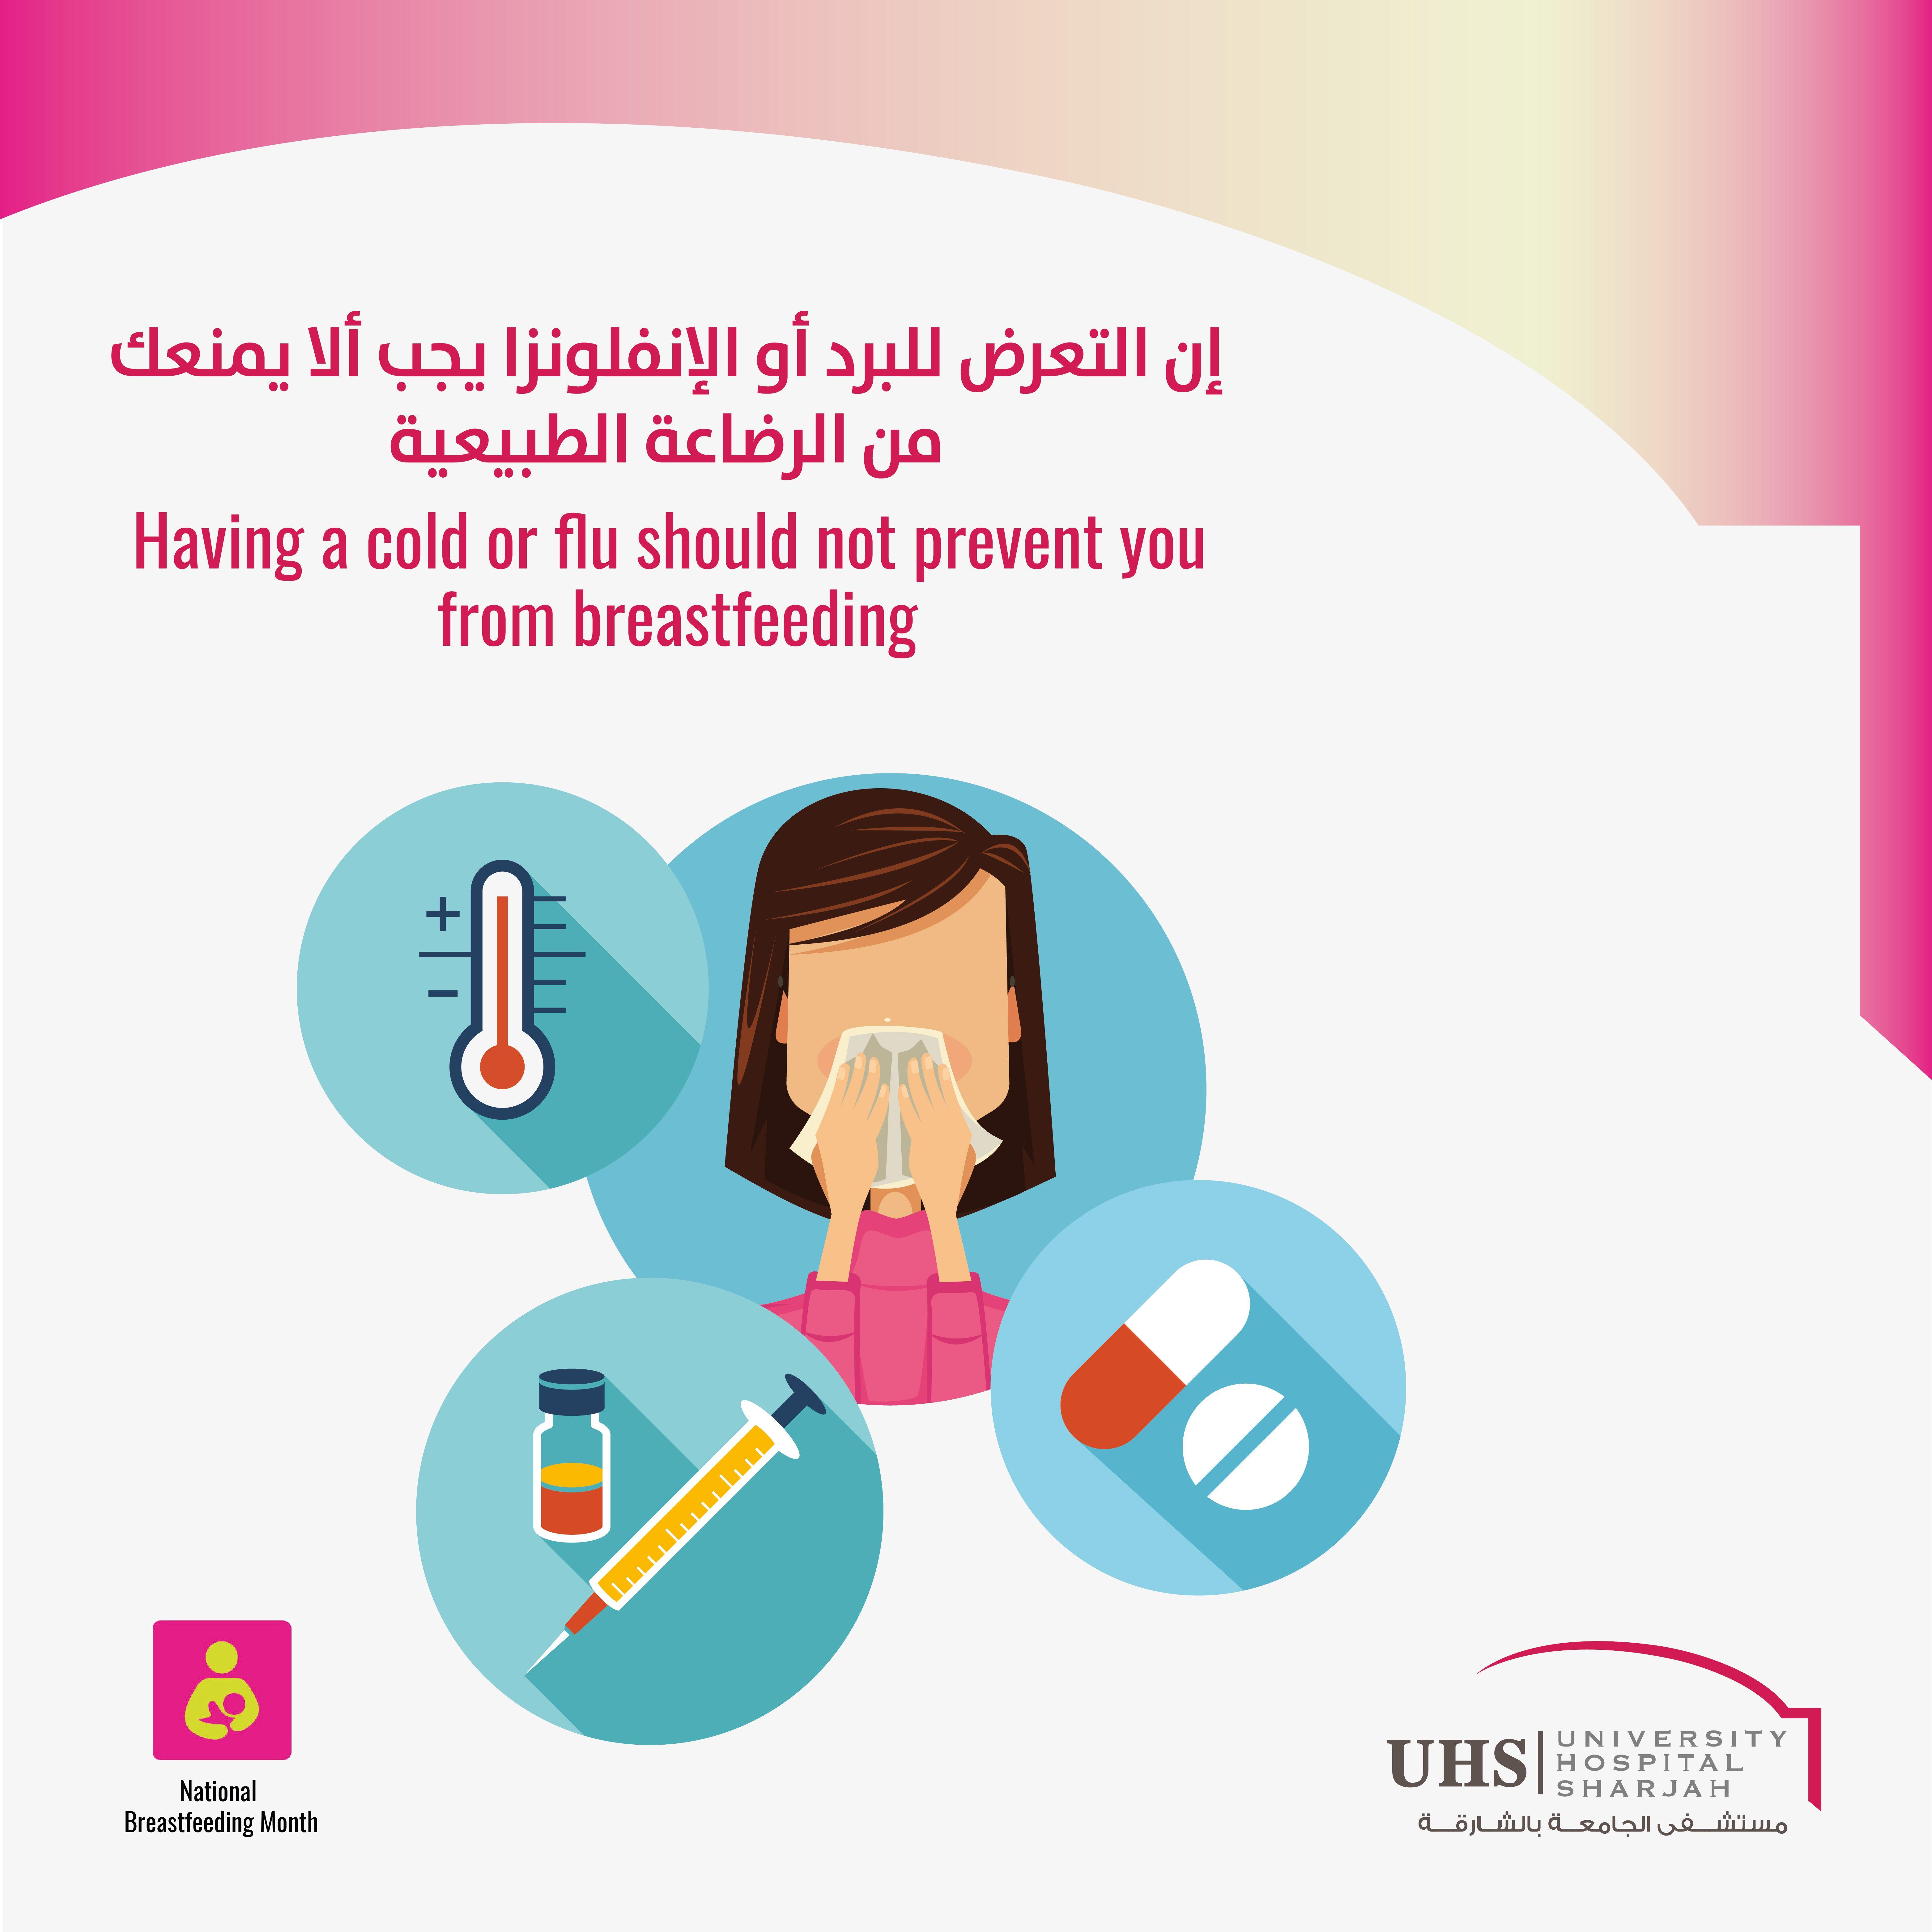 Pin By University Hospital Sharjah On Breastfeeding Awareness Month Breastfeeding Awareness Month Breastfeeding Awareness Breastfeeding